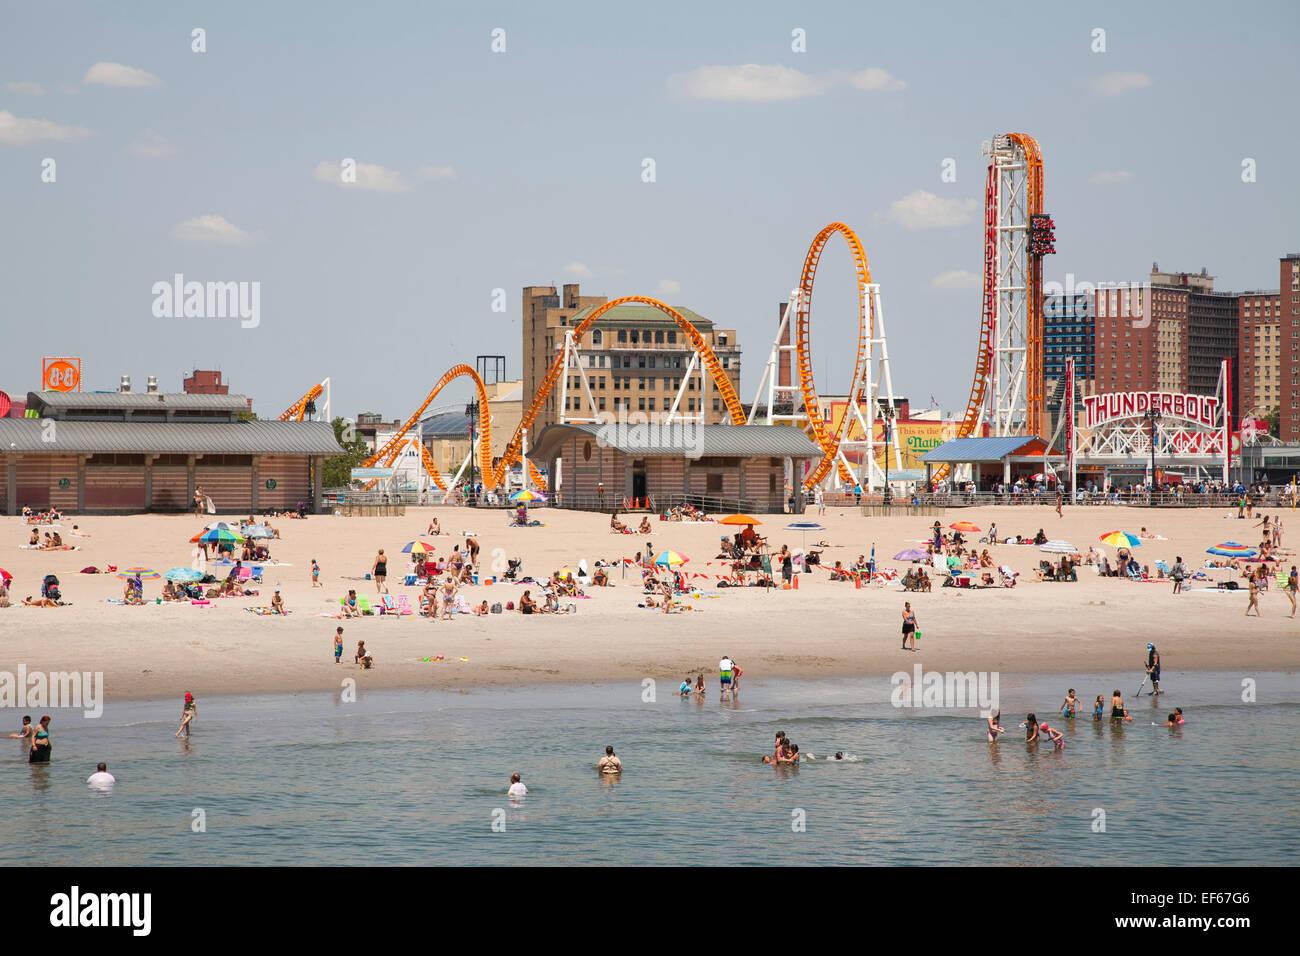 beach and amusement park, Coney Island, New York, USA, America - Stock Image